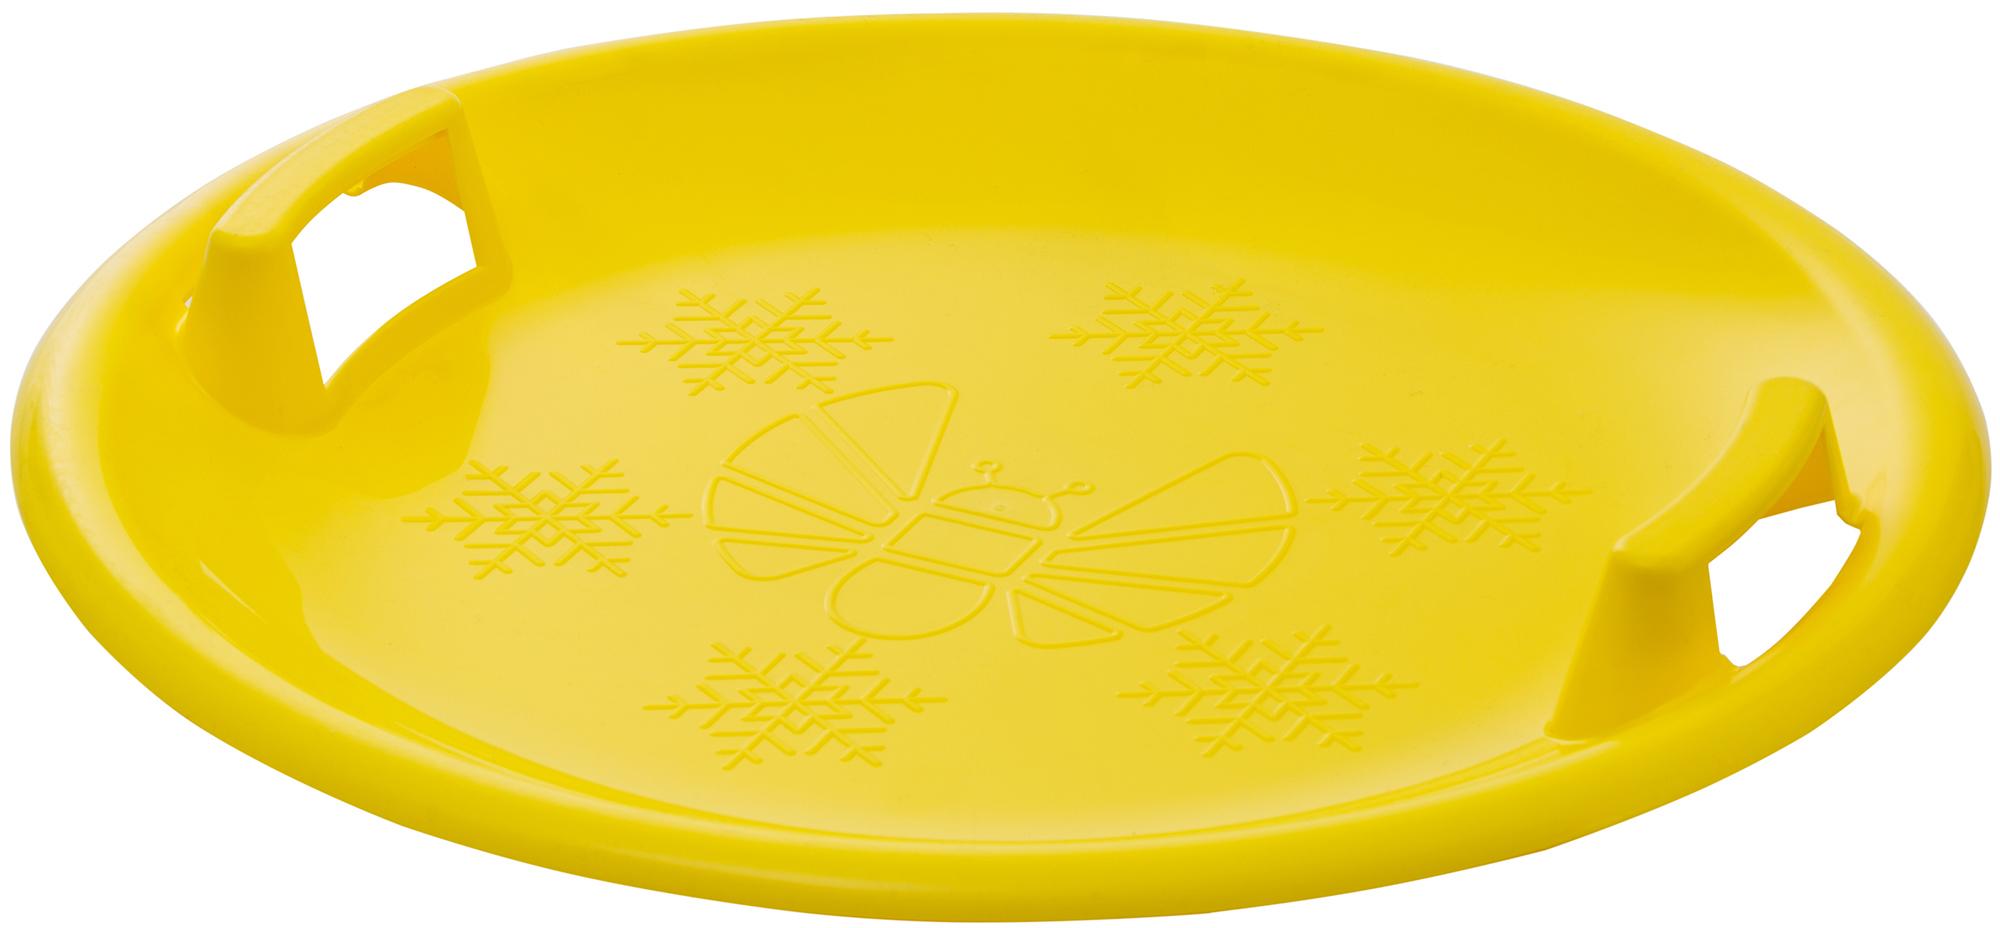 Пчёлка Санки-тарелка Пчёлка